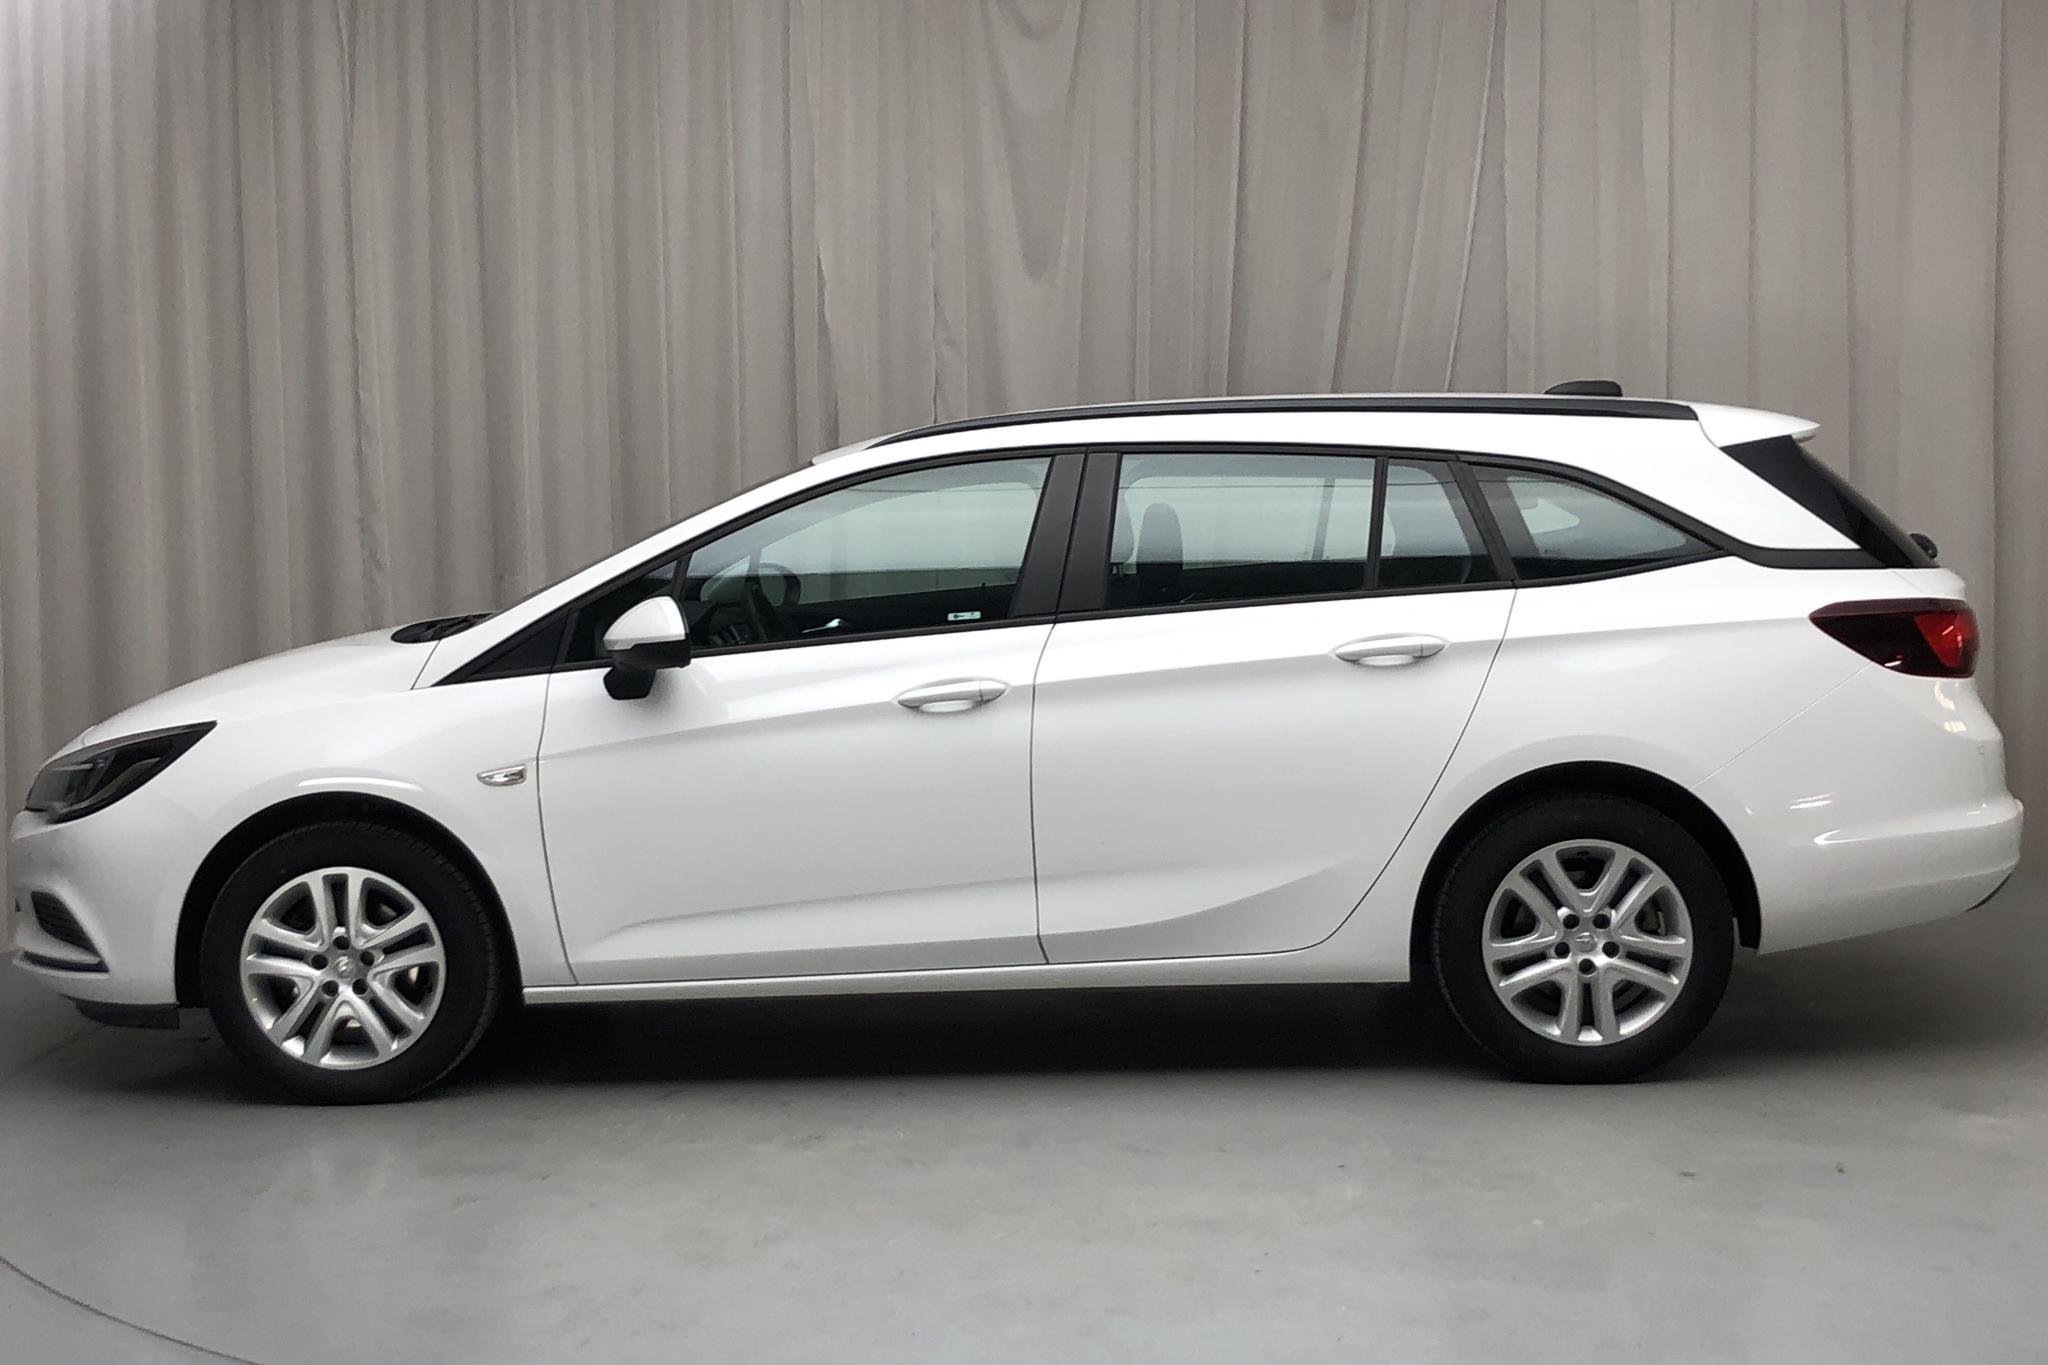 Opel Astra 1.6 CDTI ECOTEC SportsTourer (136hk) - 43 270 km - Automatic - white - 2017